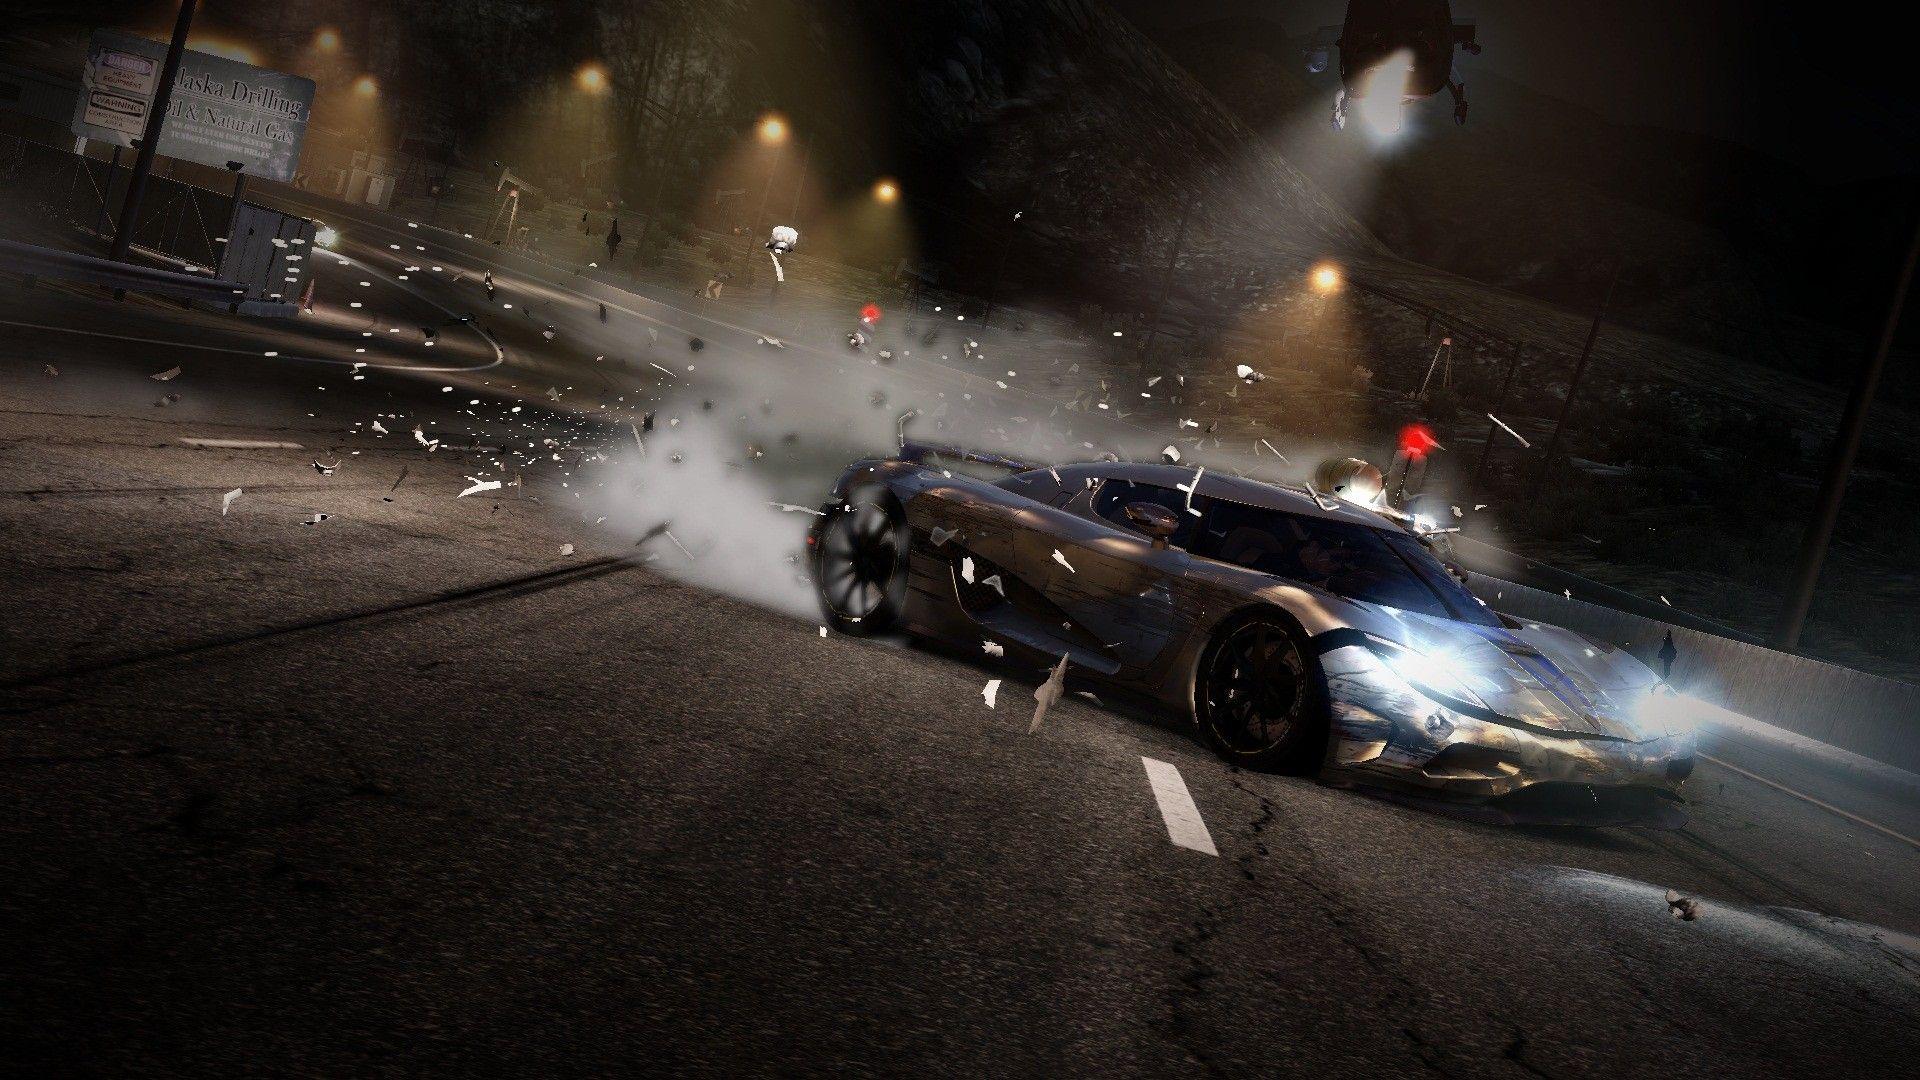 Etk 856t Beamng Drive In 2020 Car Crash Sports Car Driving